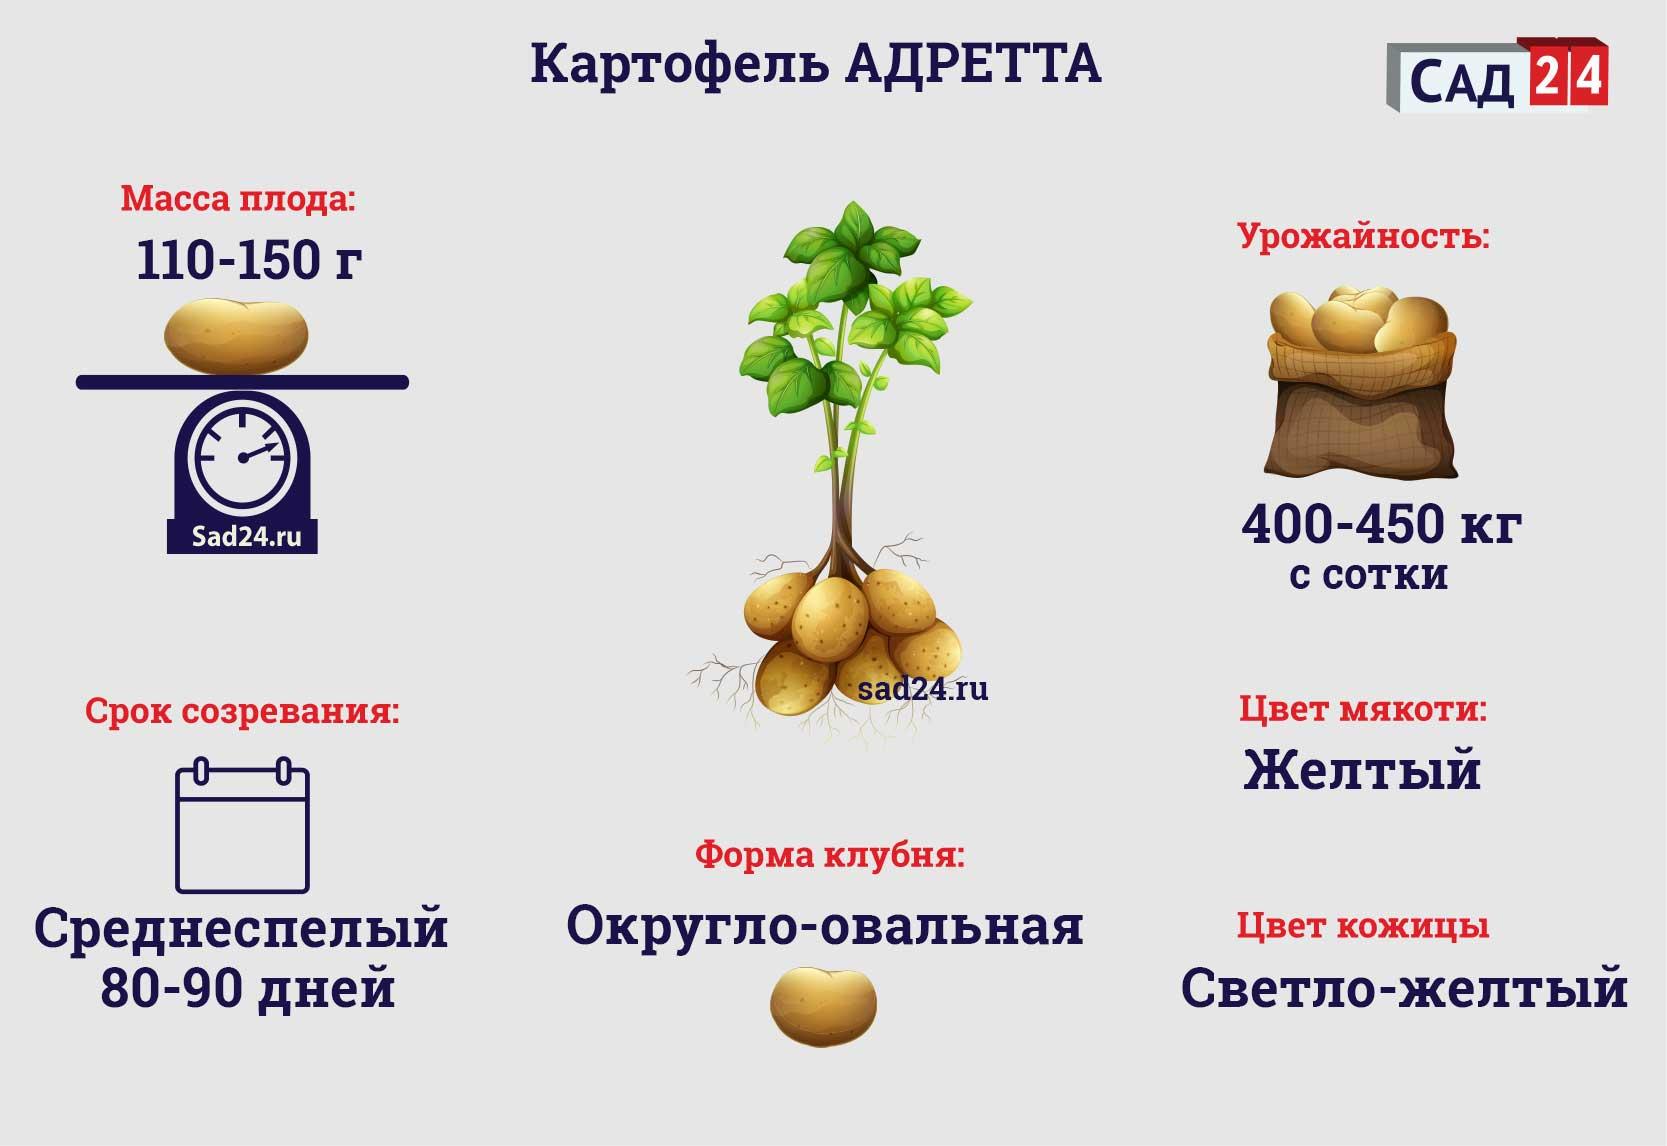 Адретта - https://sad24.ru